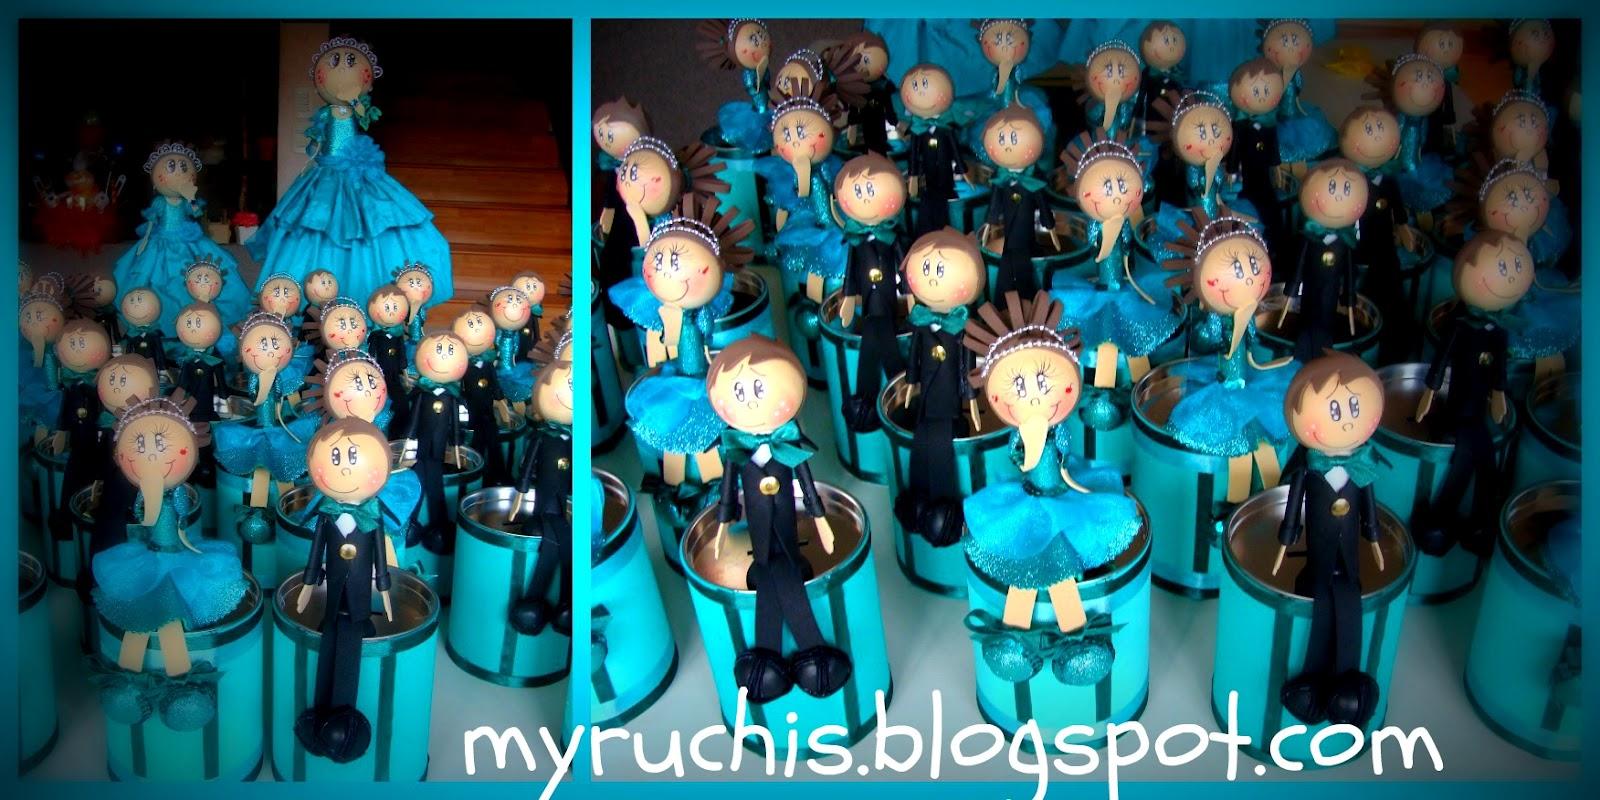 Myruchis ideas para fiestas infantiles presentaci n dany for Ideas para fiestas infantiles